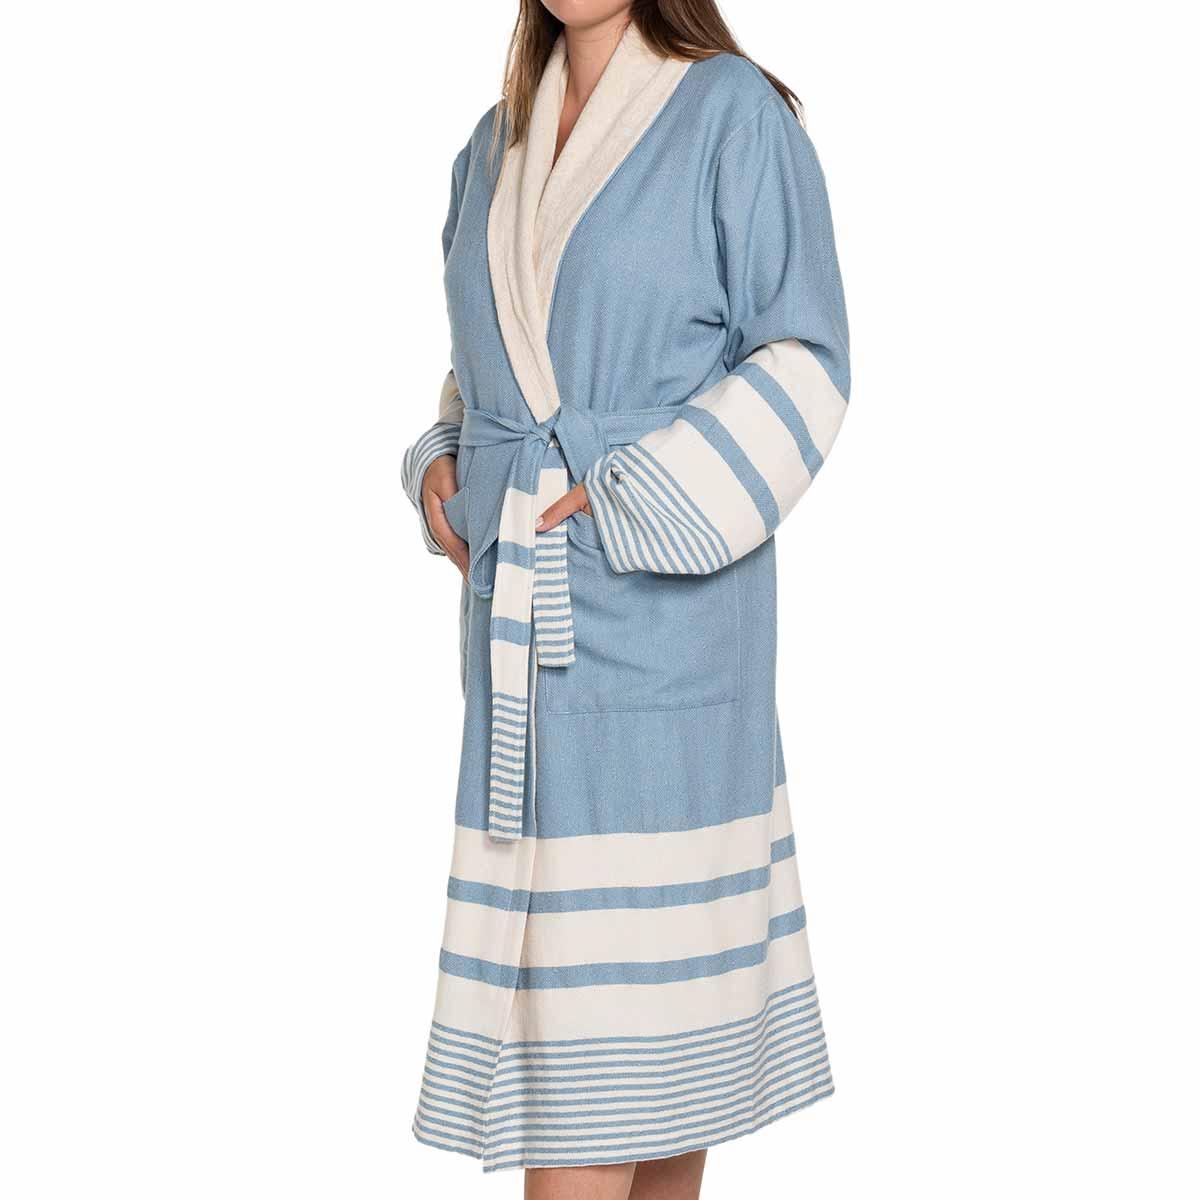 Bathrobe Tabiat with towel - Air Blue